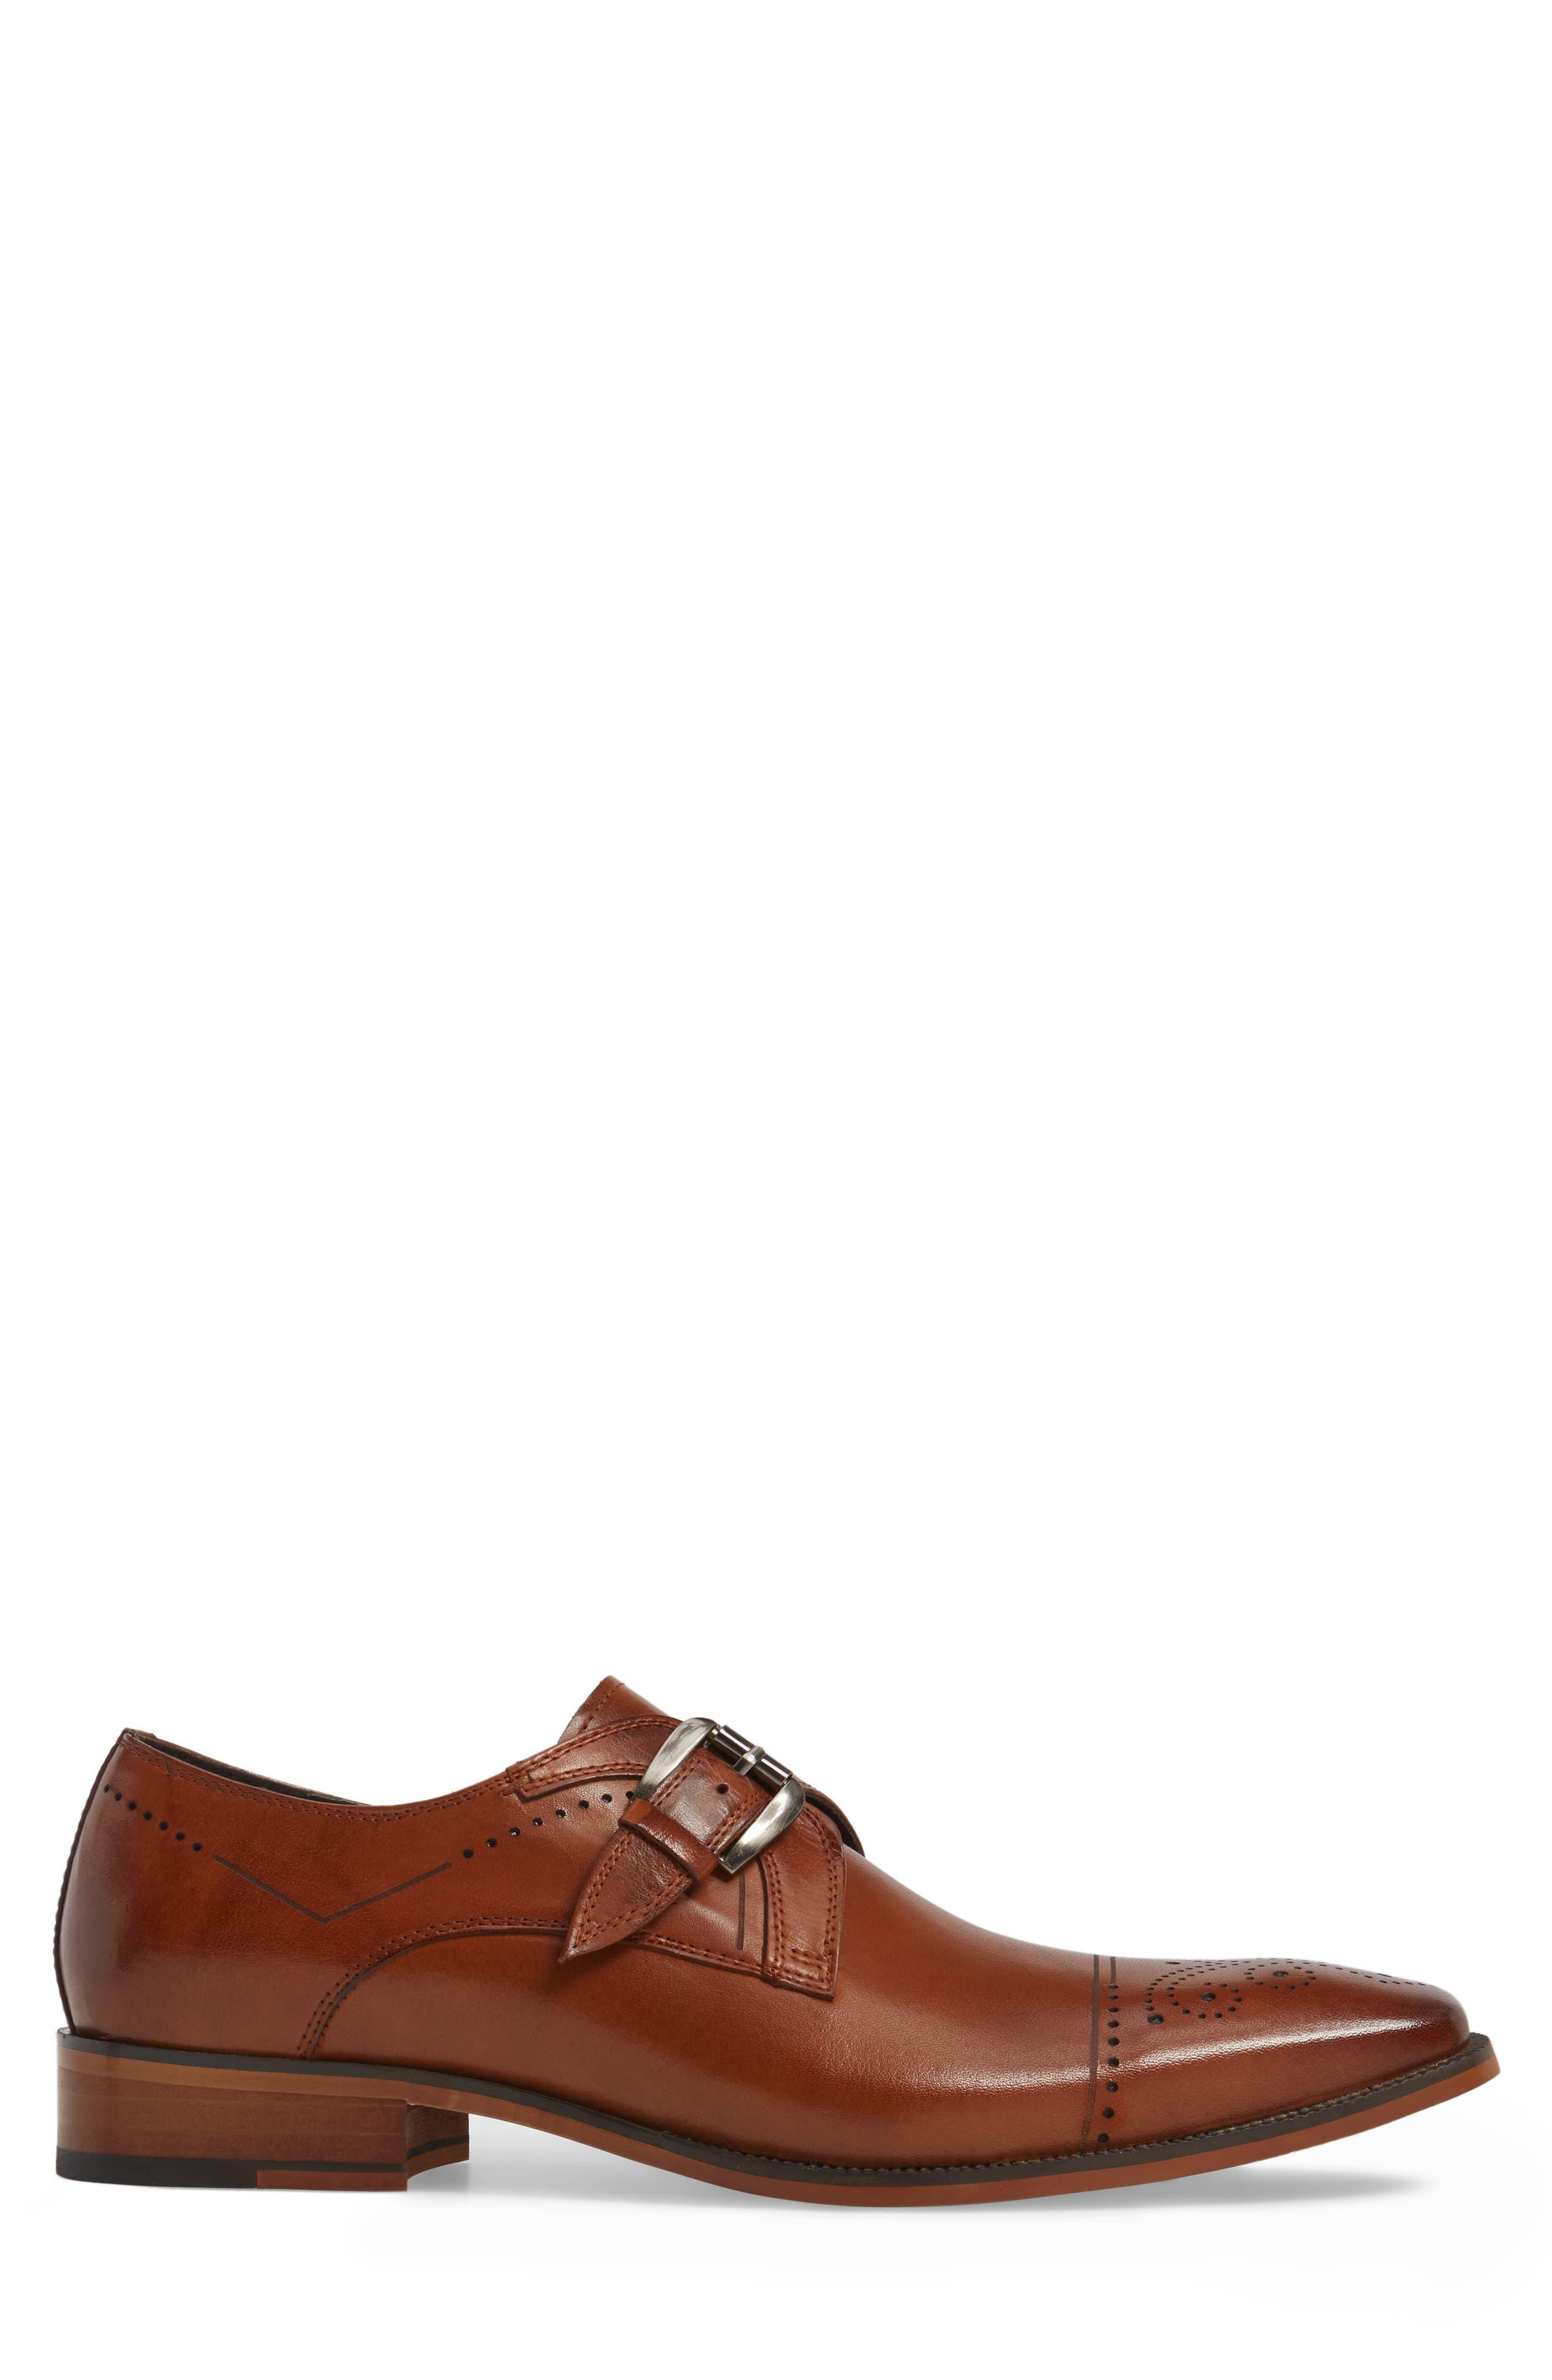 Kimball Monk Strap Shoe,                             Alternate thumbnail 3, color,                             SADDLE TAN LEATHER